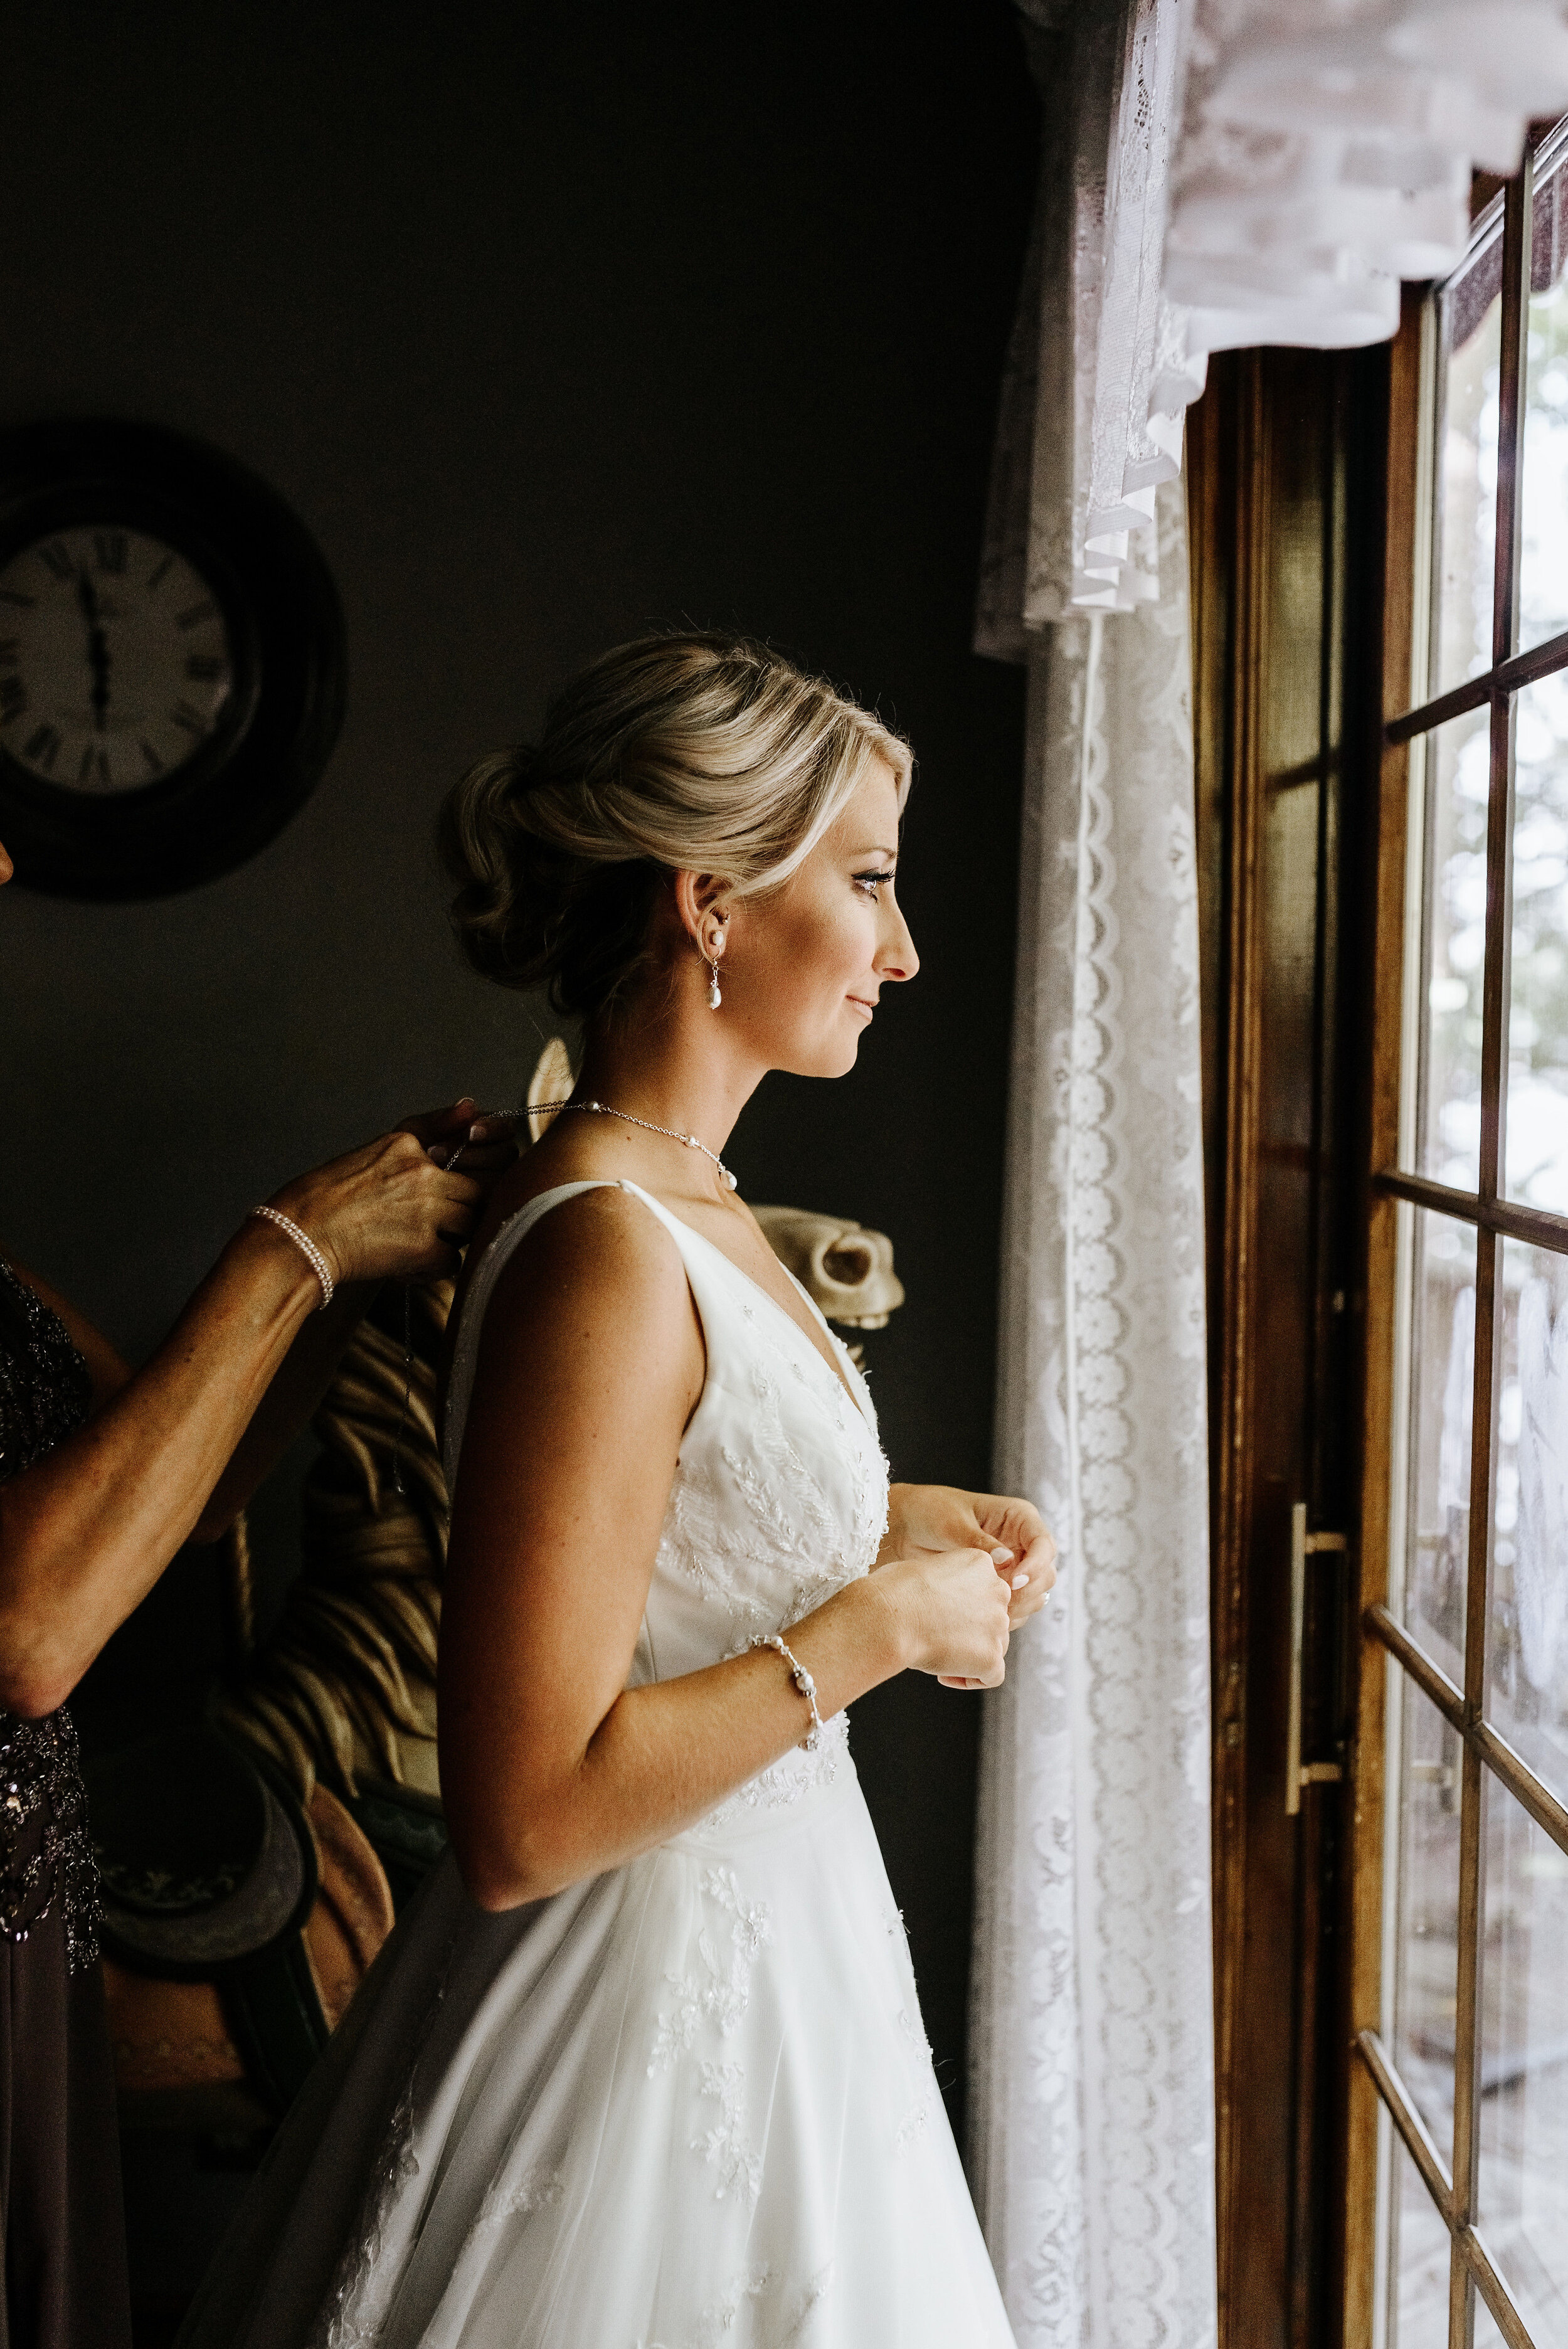 Emily_Mike_Wedding_Celebrations_at_the_Reservoir_Pool_Pavilion_Richmond_Virginia_Wedding_Photographer_Photography_by_V_10.jpg